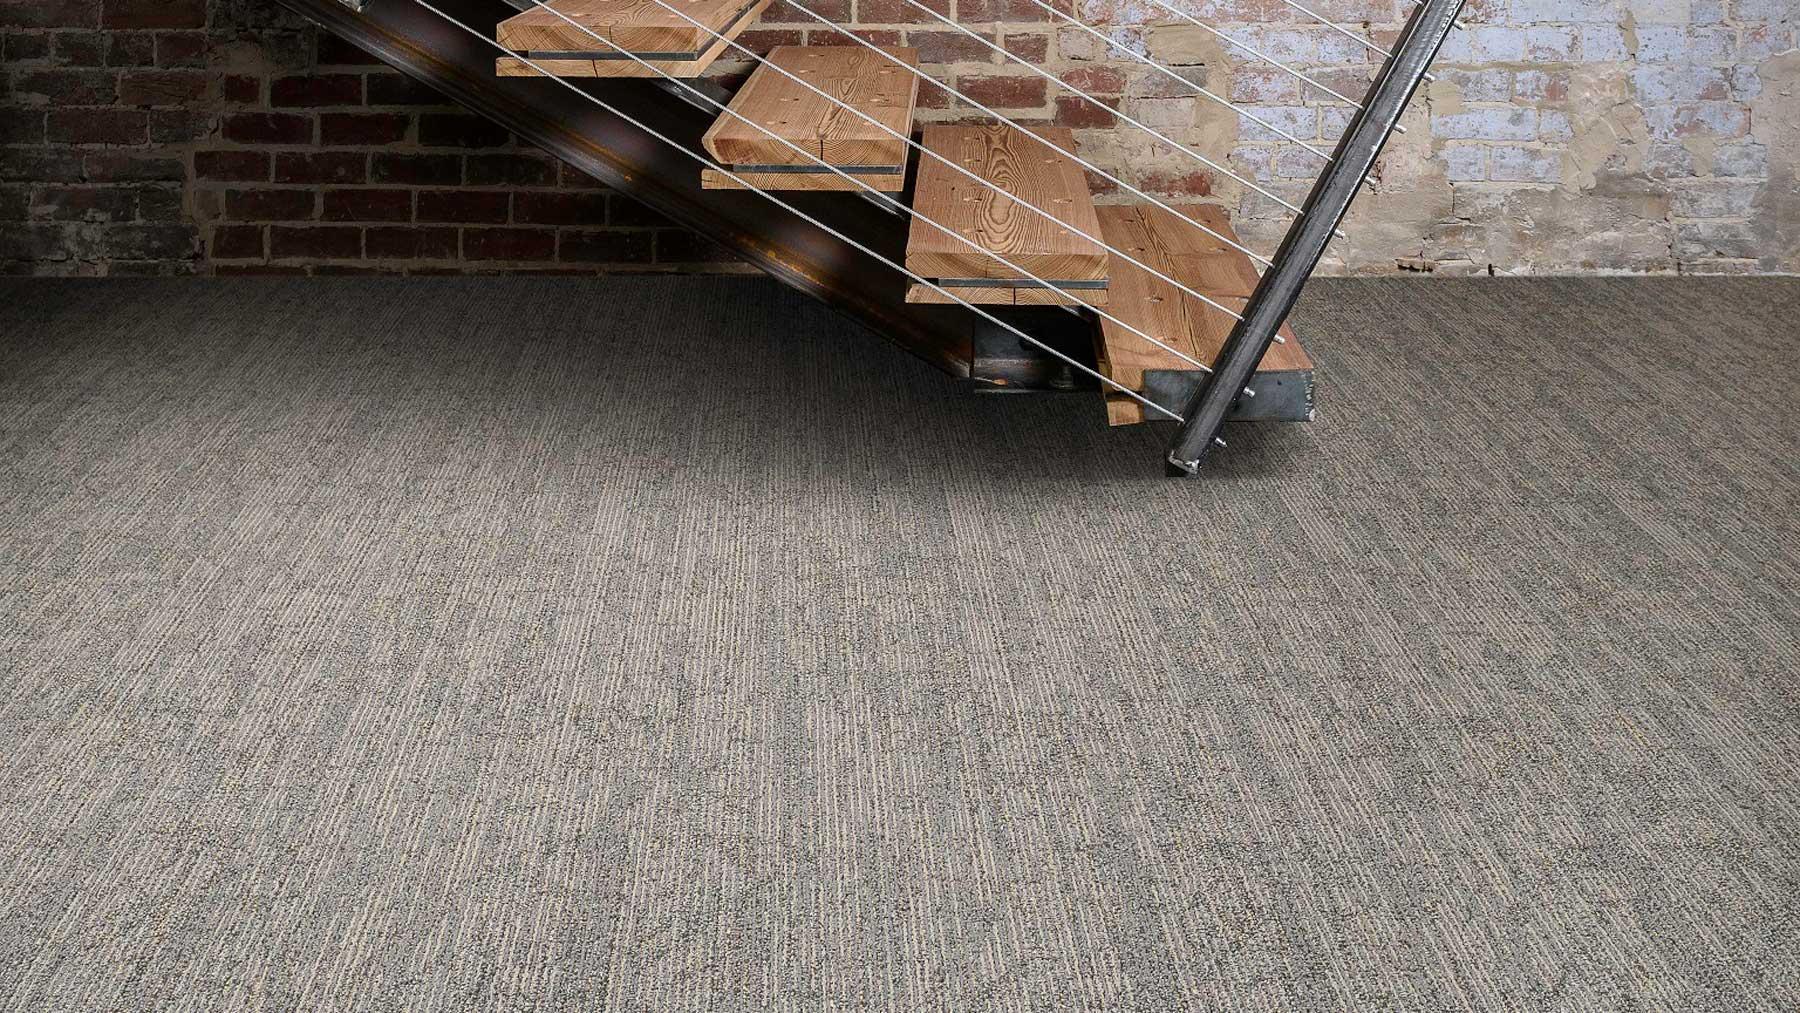 Flooring henricksen dailygadgetfo Images